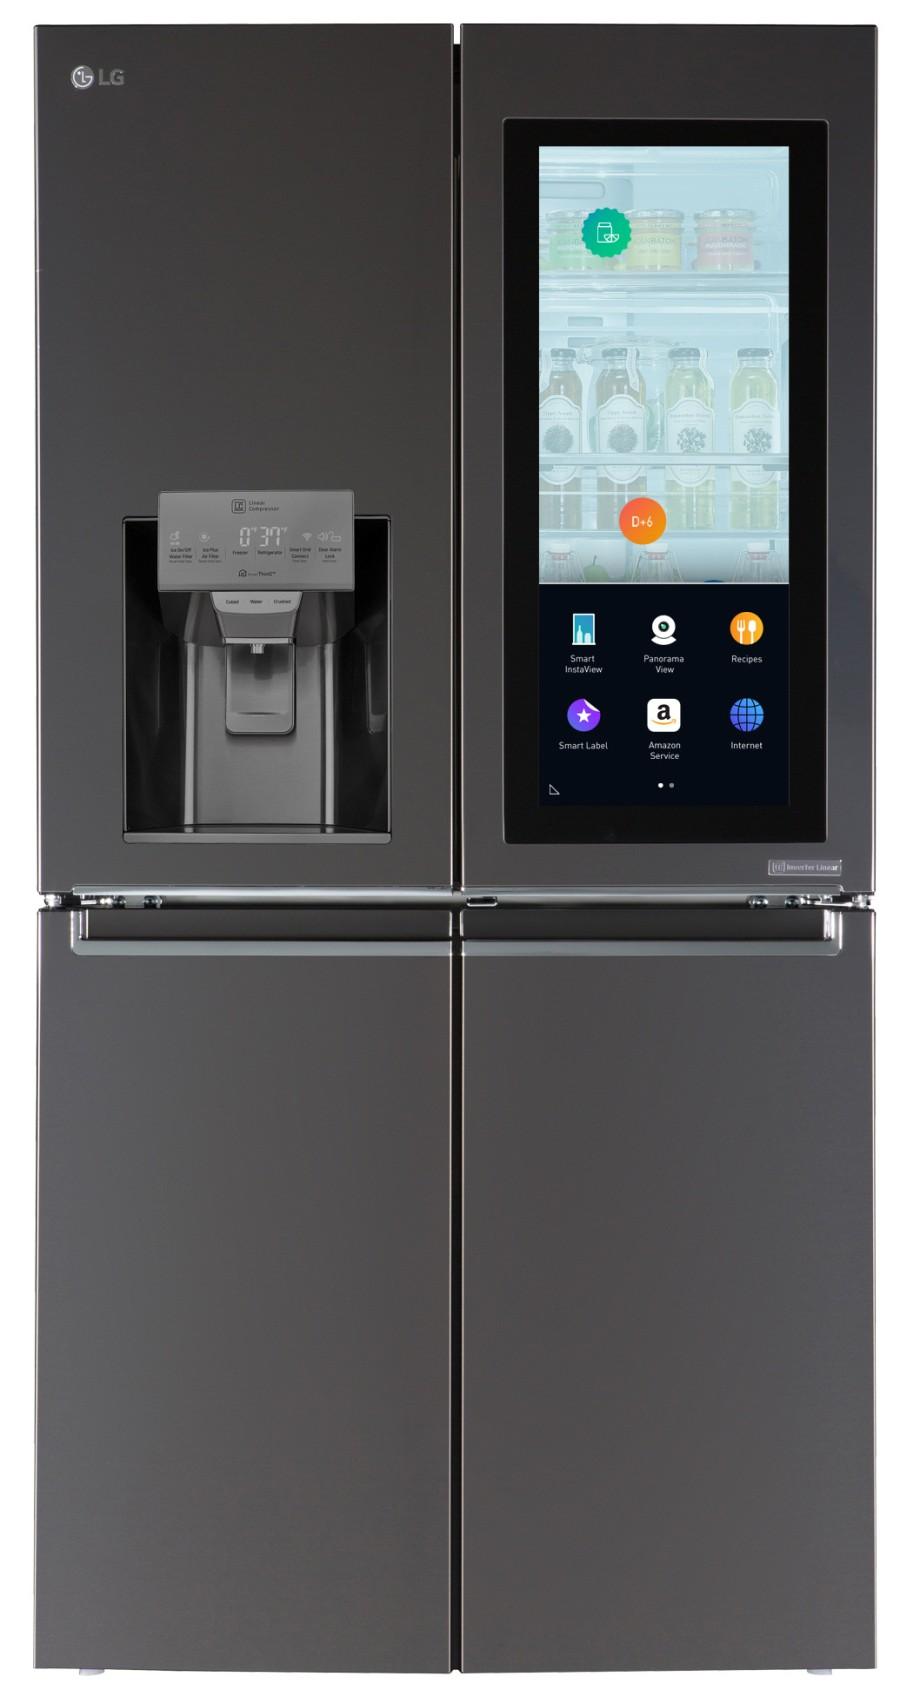 lg-smart-instaview-refrigerator